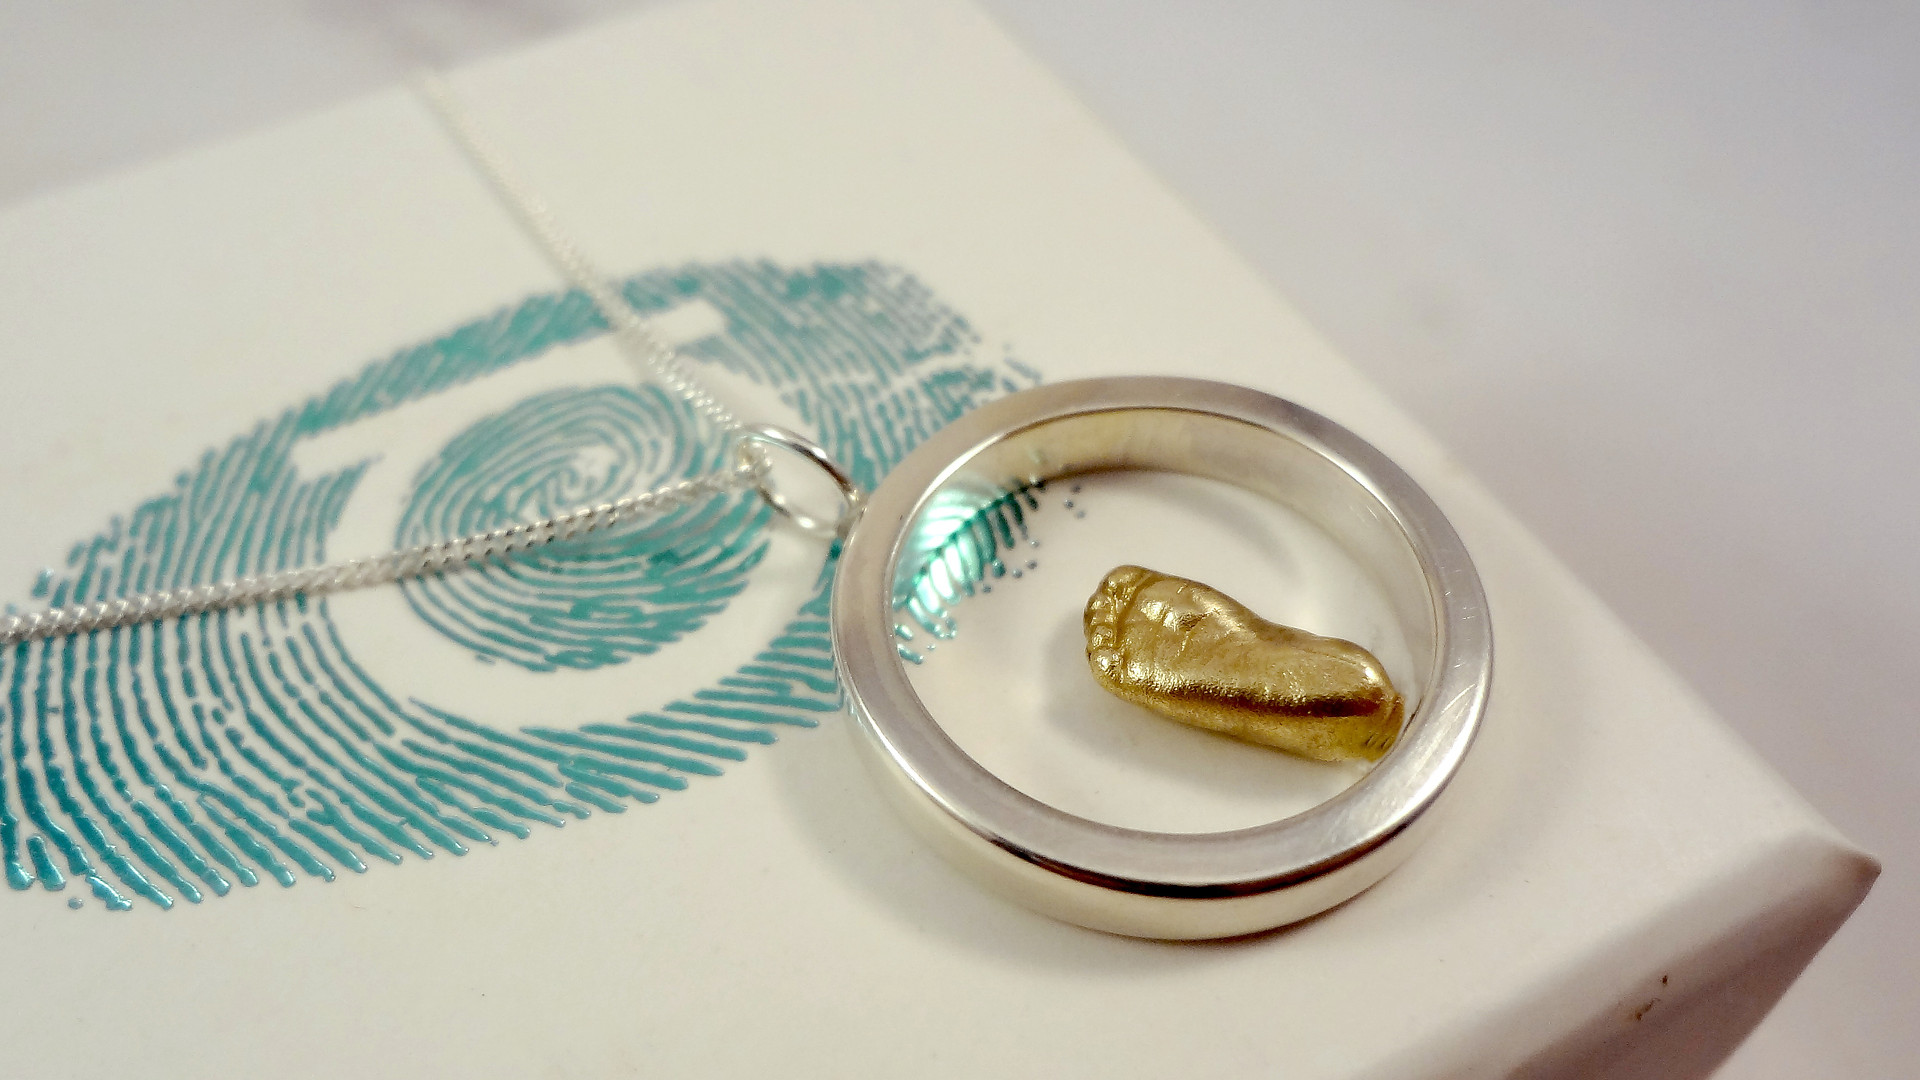 gold eternity pendant for mum & baby